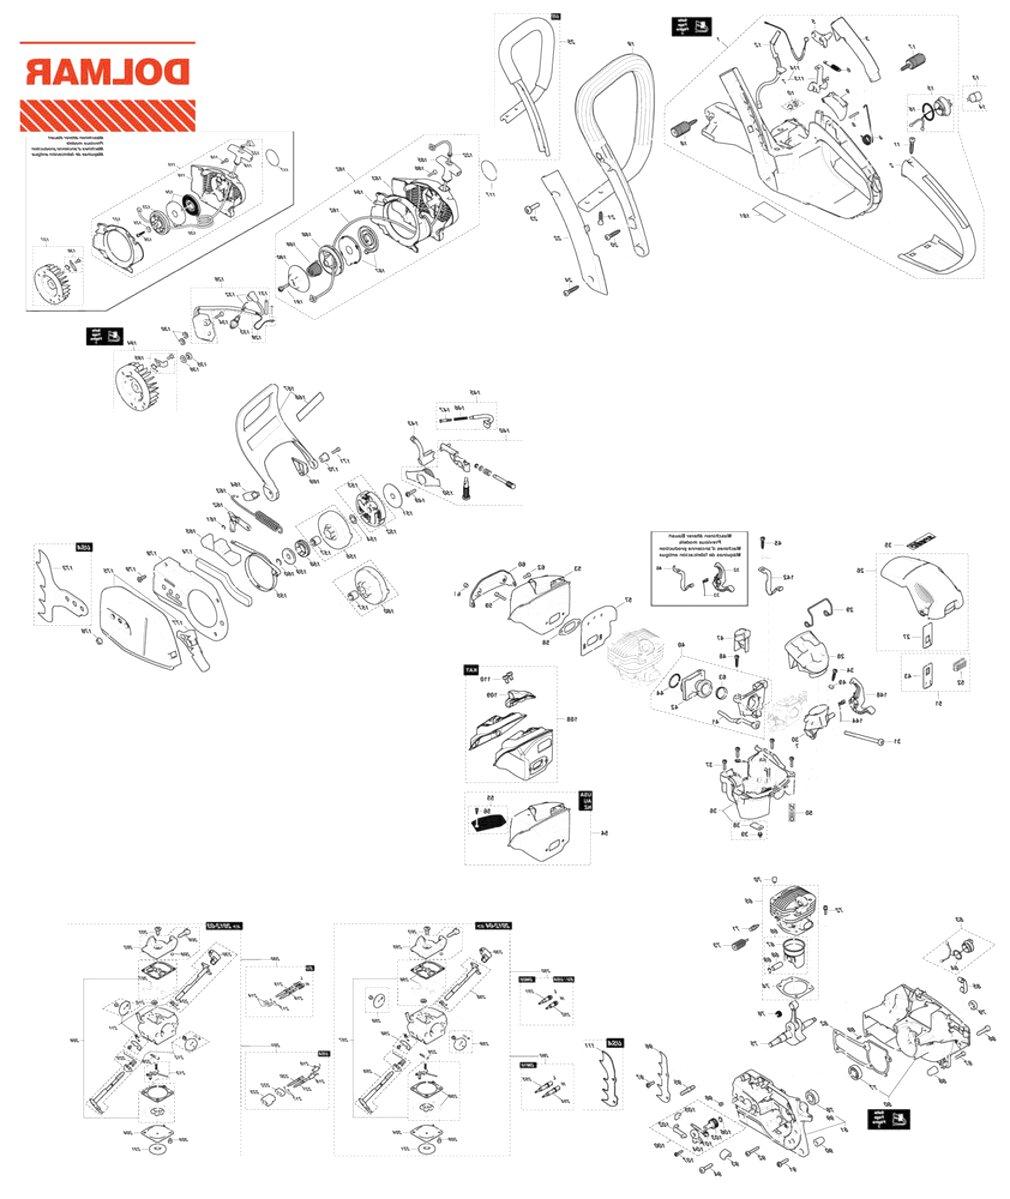 Bremsband PS 4605 Original Ersatzteil Dolmar Säge PS 550 PS 5000